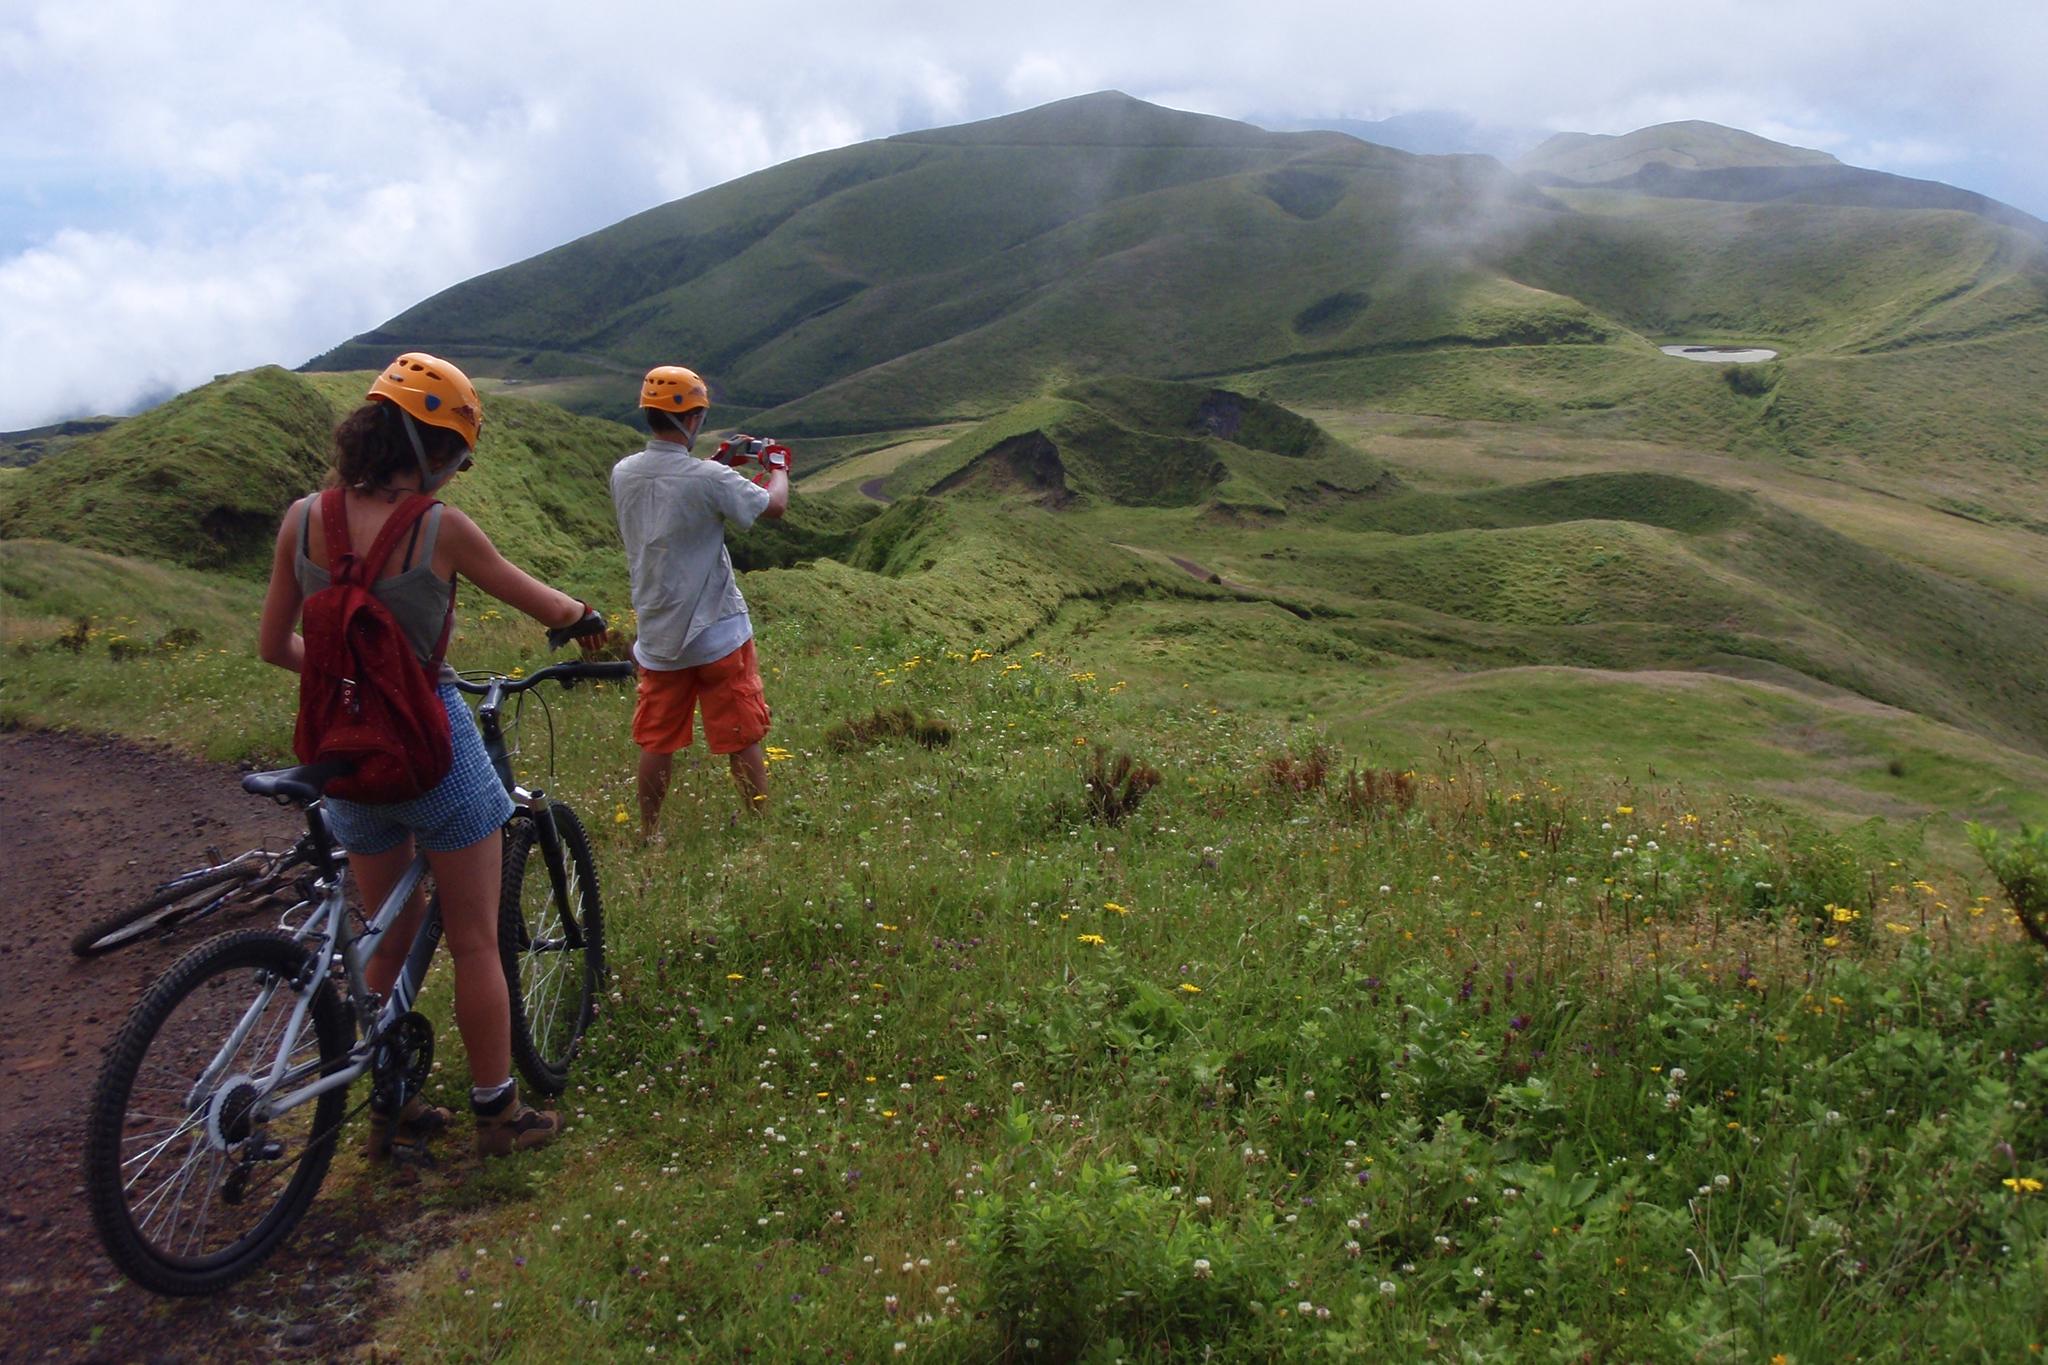 passeio-bicicleta-explore-sao-jorge